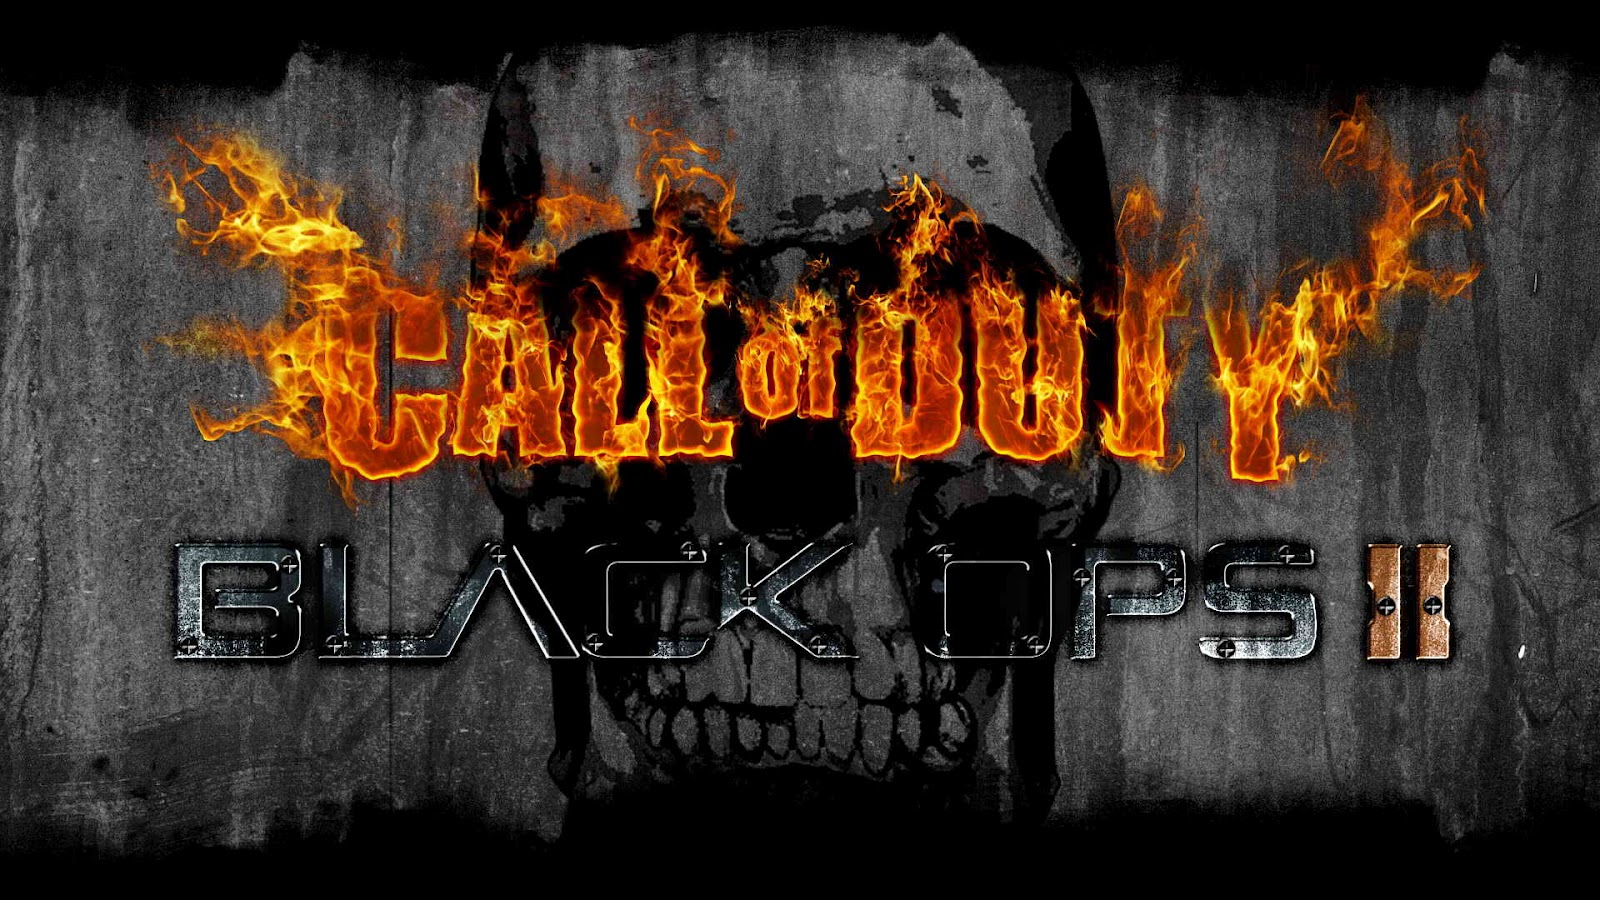 Black Ops 3 Hd Wallpaper: HD WALLPAPERS MANIA: Call Of Duty Black Ops 2 HD Wallpapers